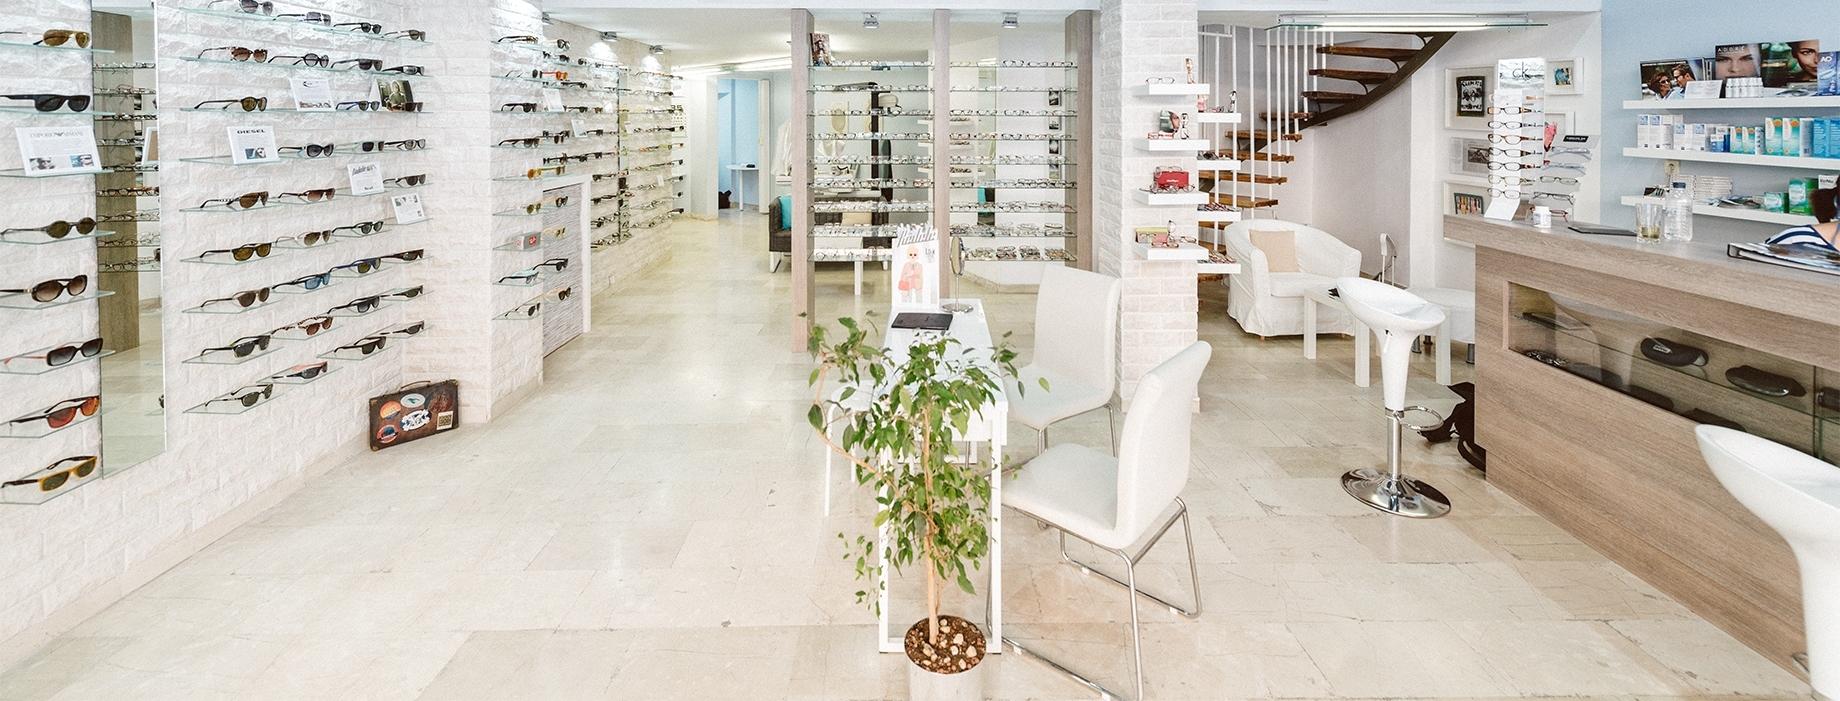 the-optical-center